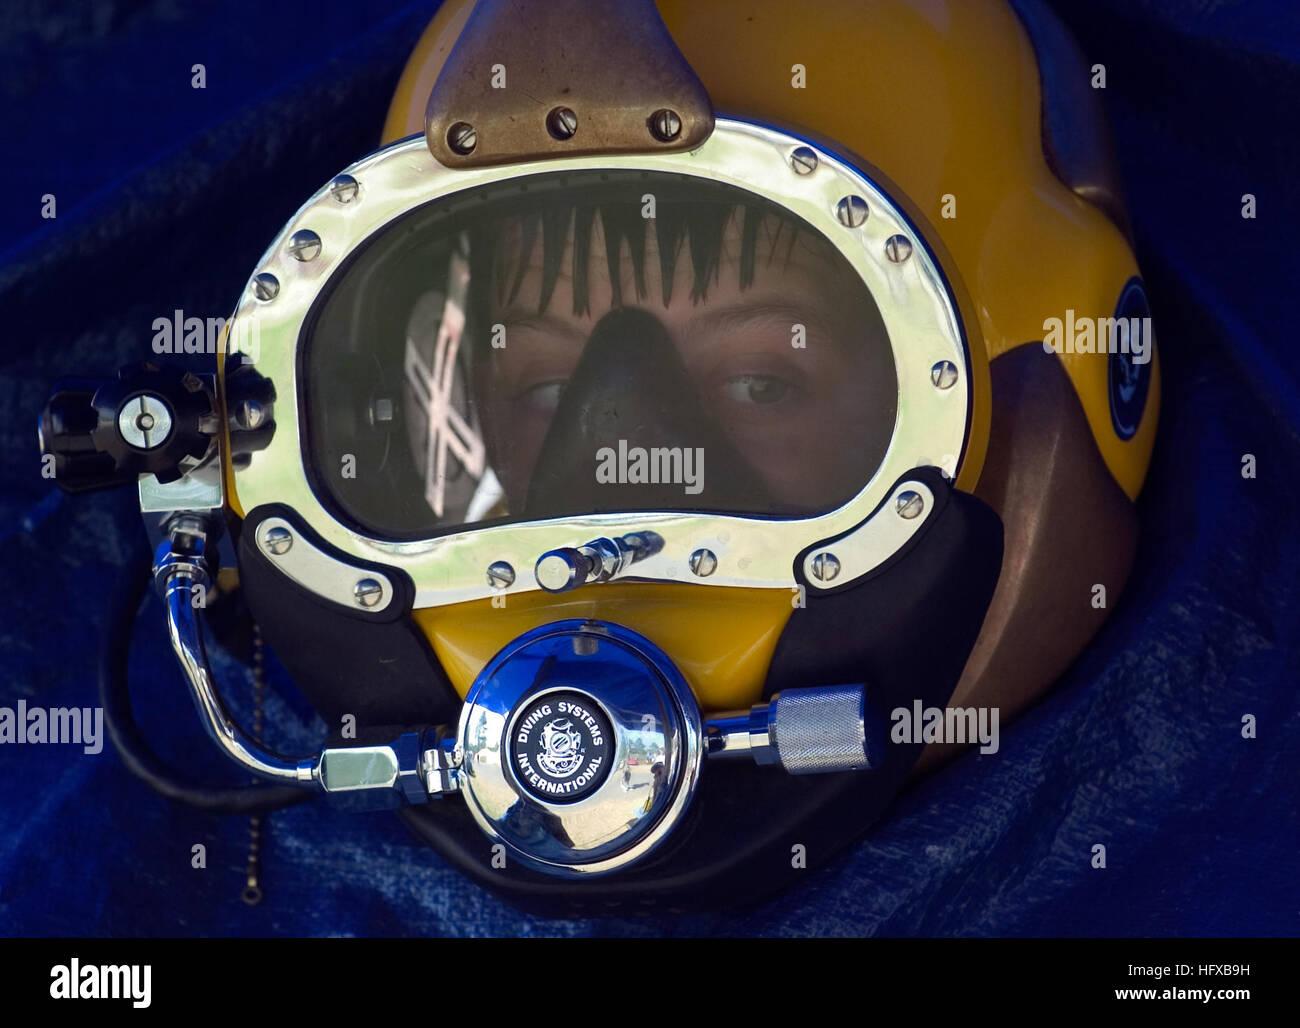 050727-N-0295M-008 Fort A.P. Hill, Va. (July 27, 2005) - A Boy Scout looks through a U.S. Navy MK-21 diving helmet - Stock Image